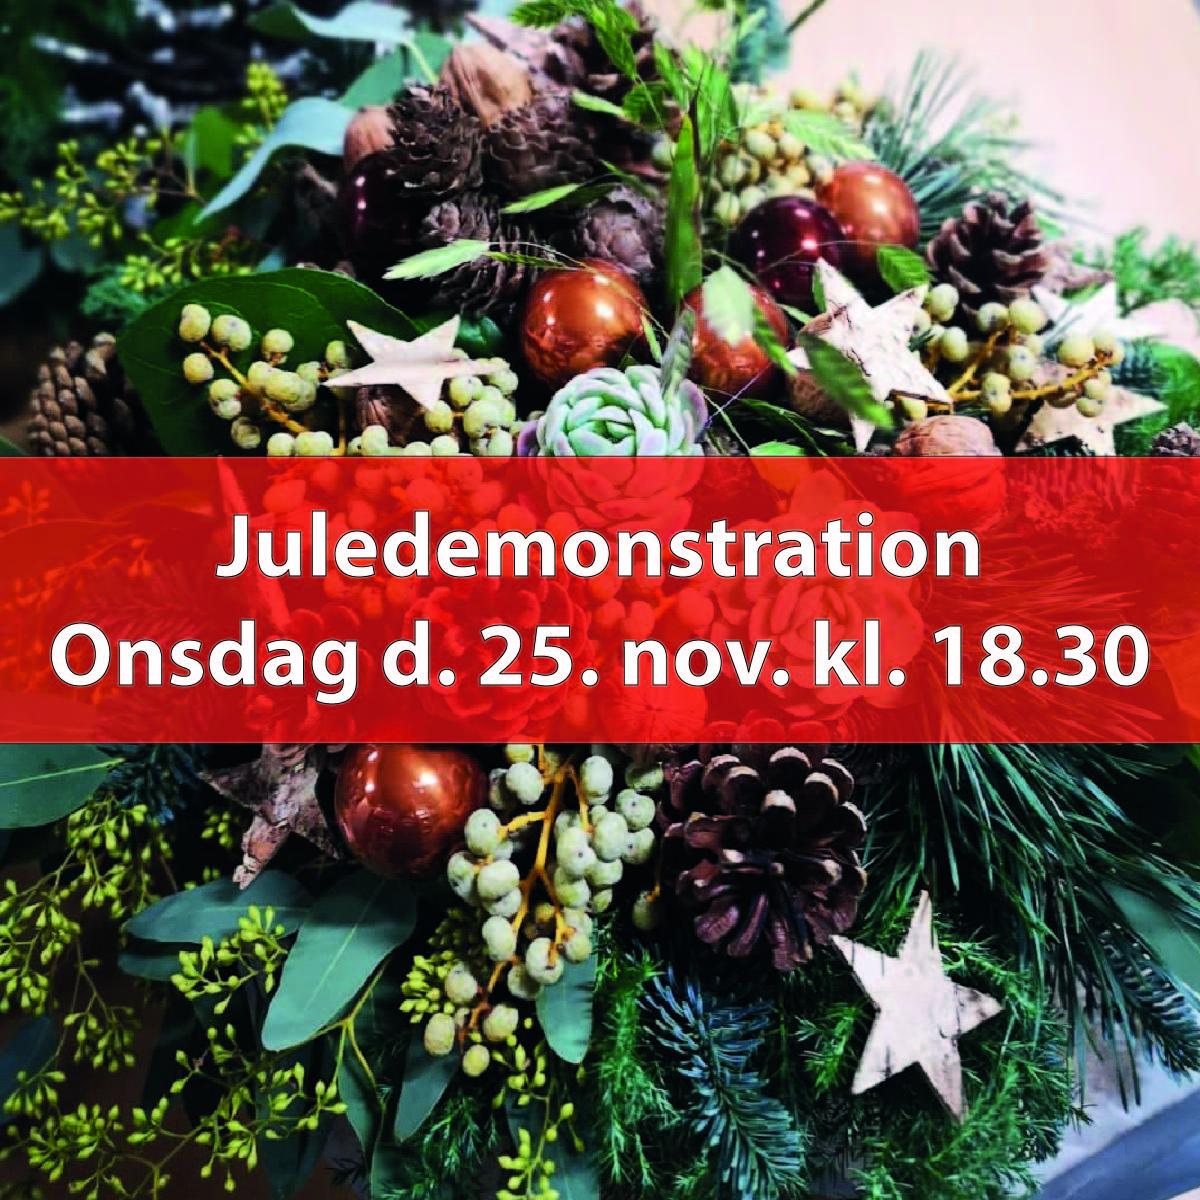 Juledemonstration, Onsdag 25. nov., kl. 18.30